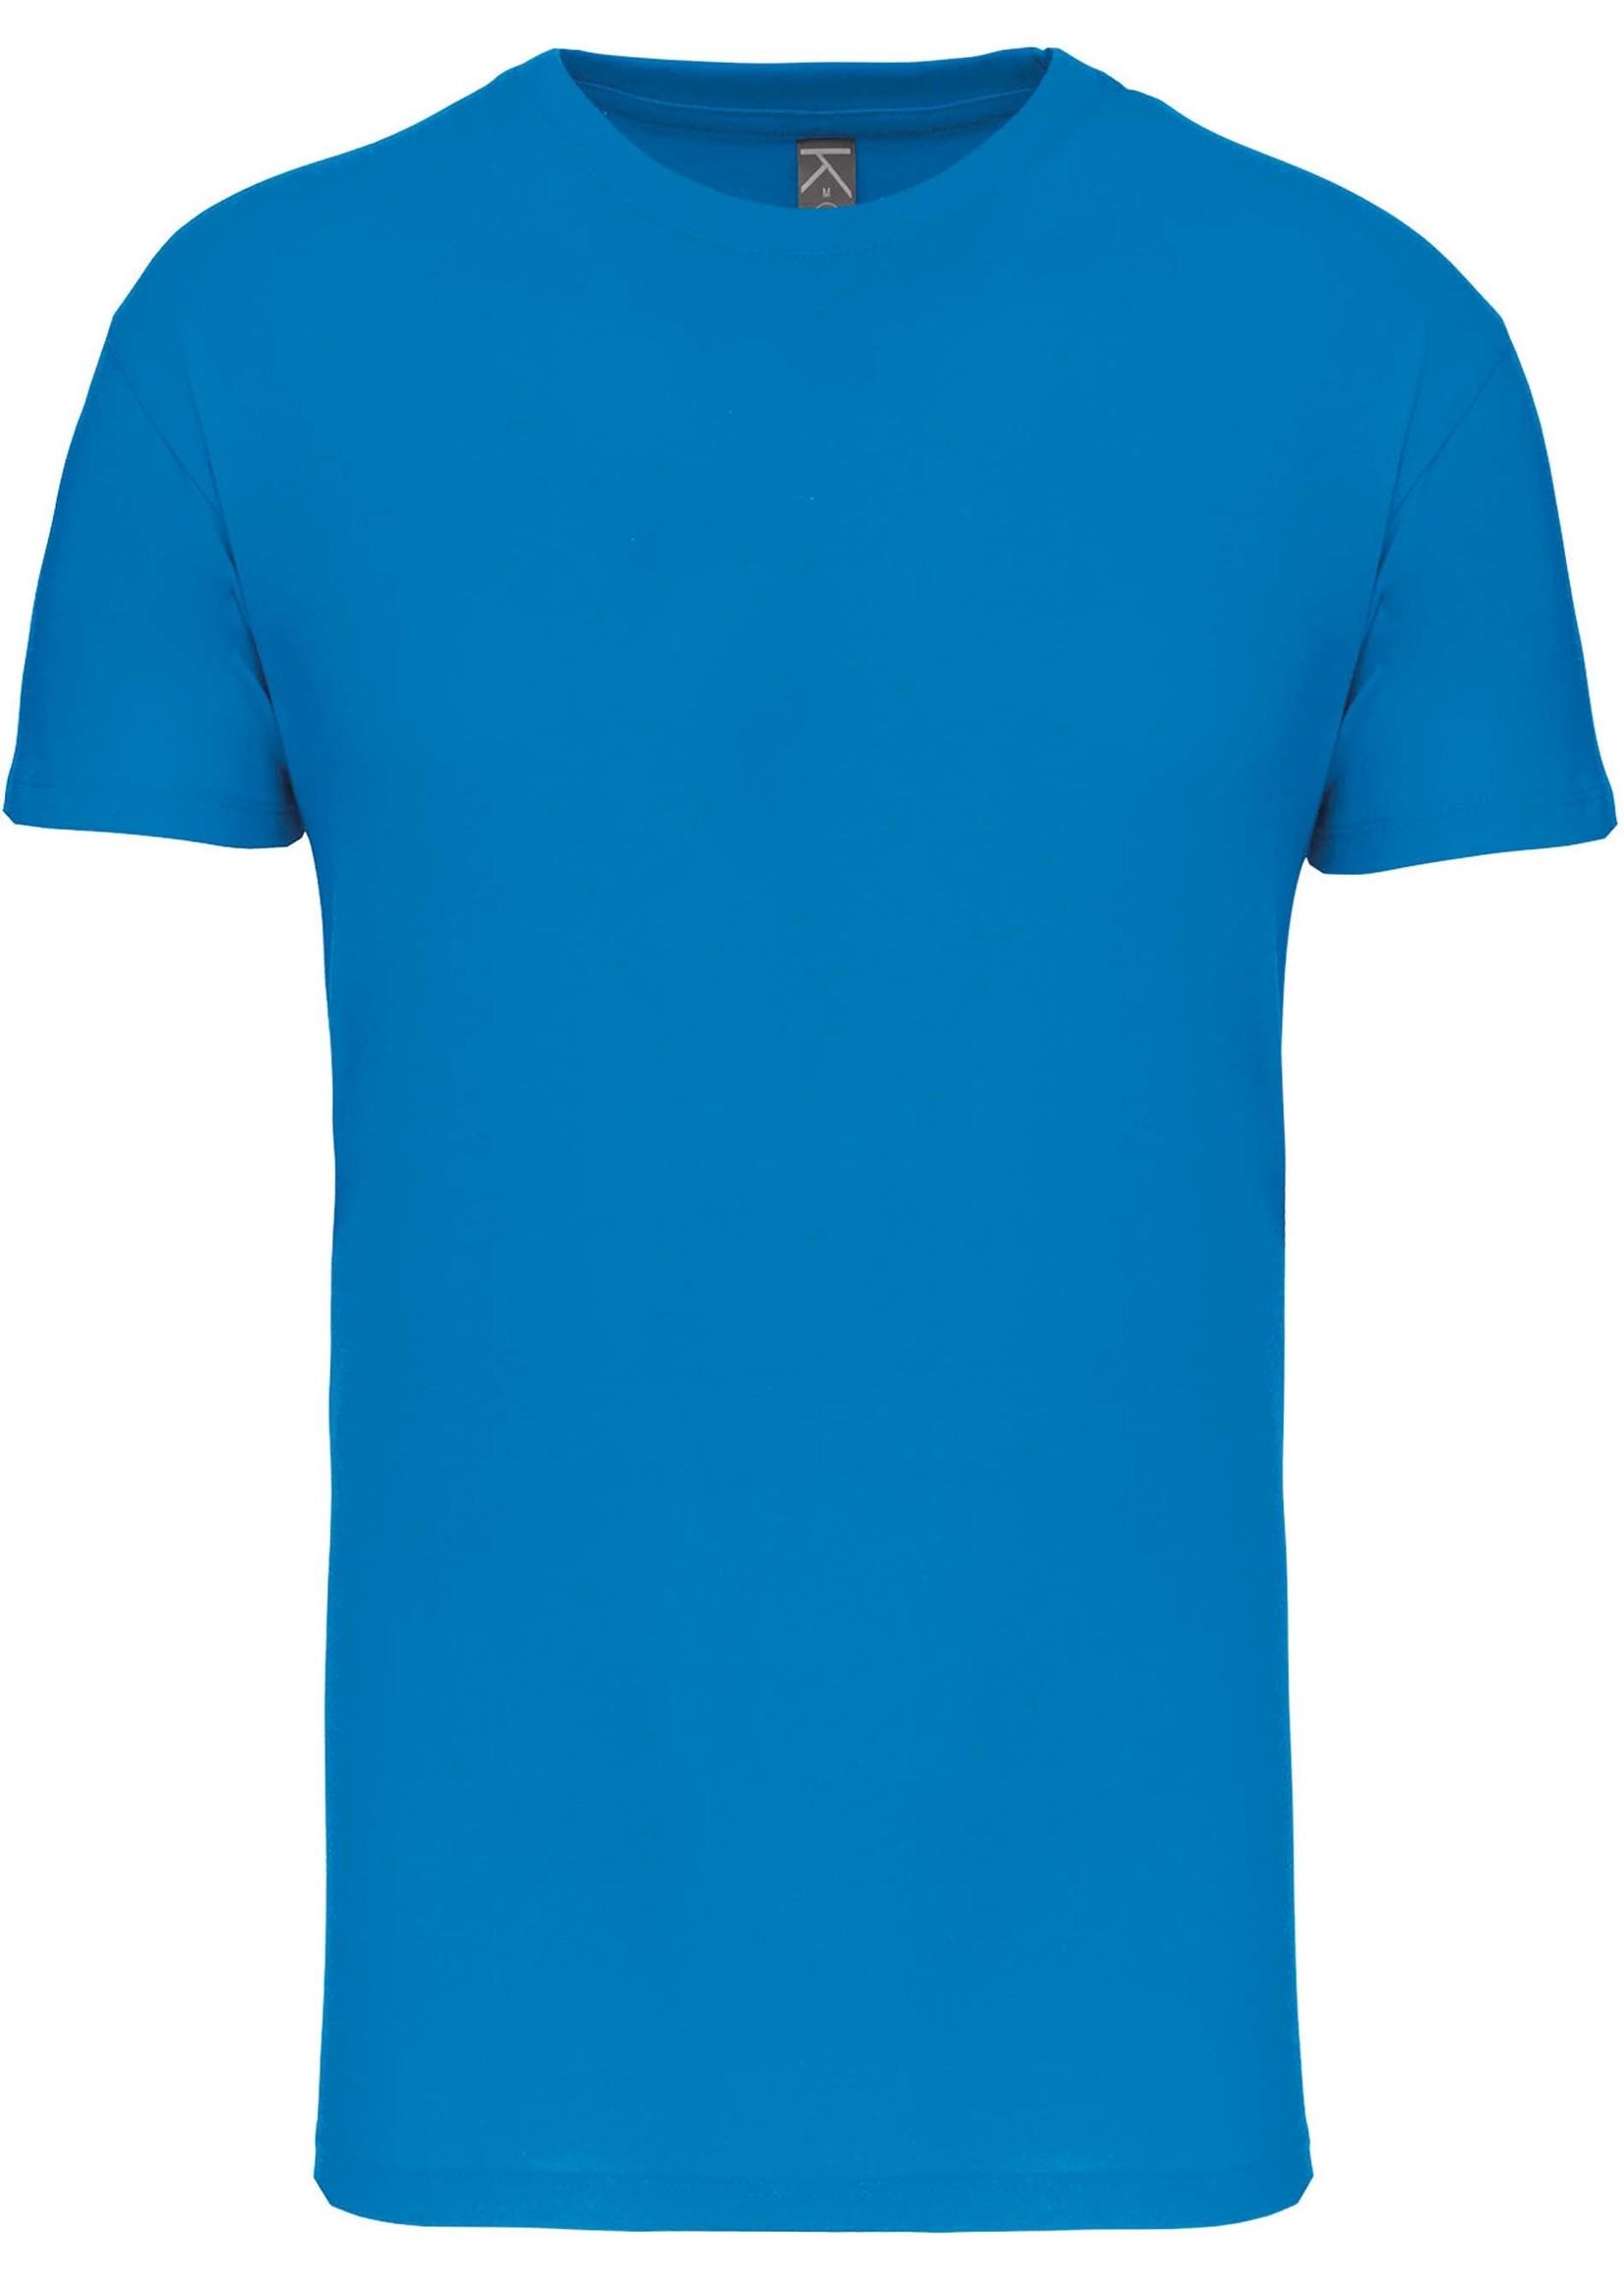 Eco-Friendly KIDS T-shirt - Light Royalblue